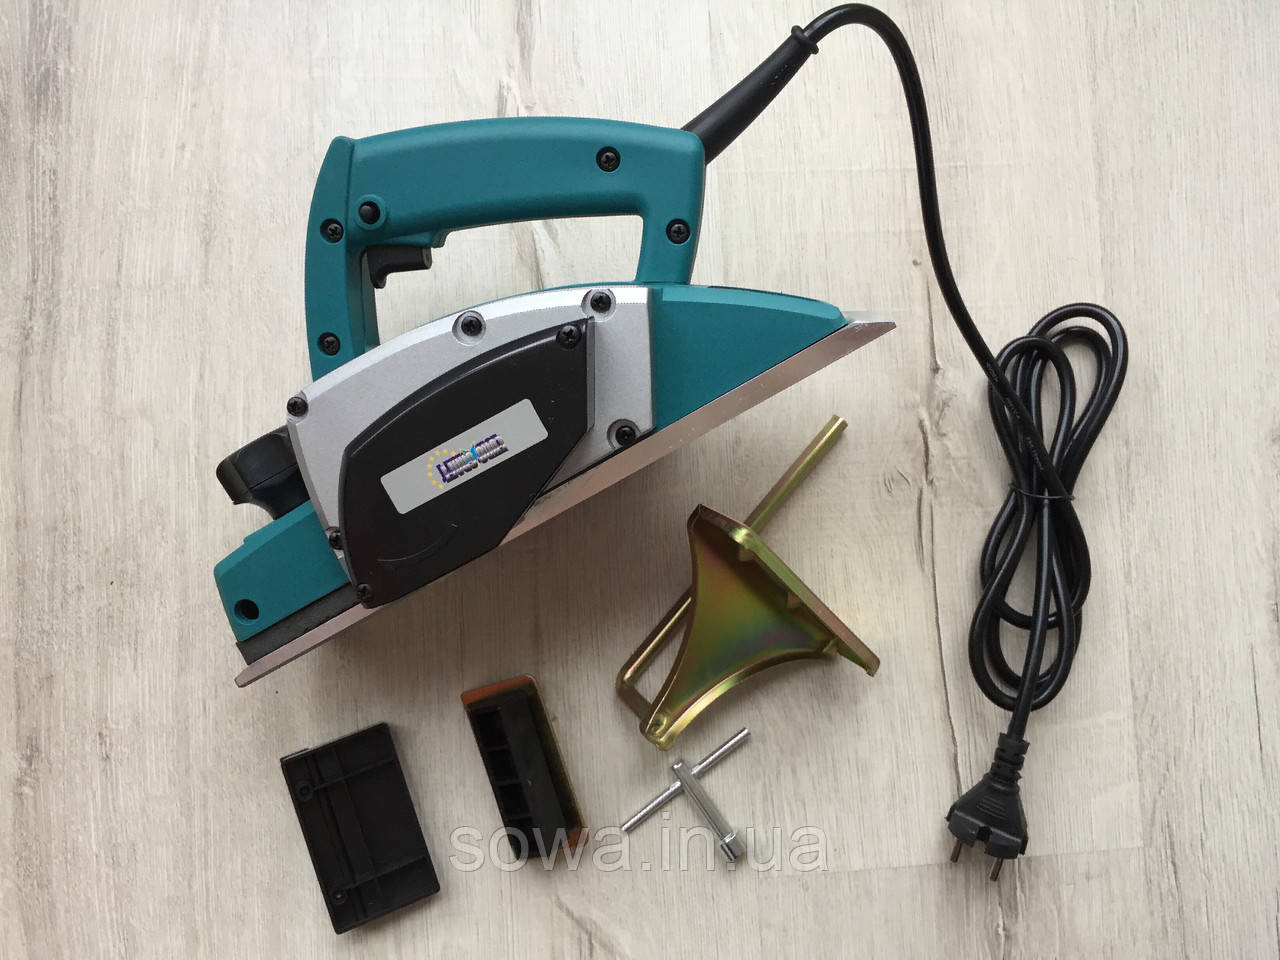 ✔️ Рубанок електрический Euro Сraft EP210  | 1300Вт